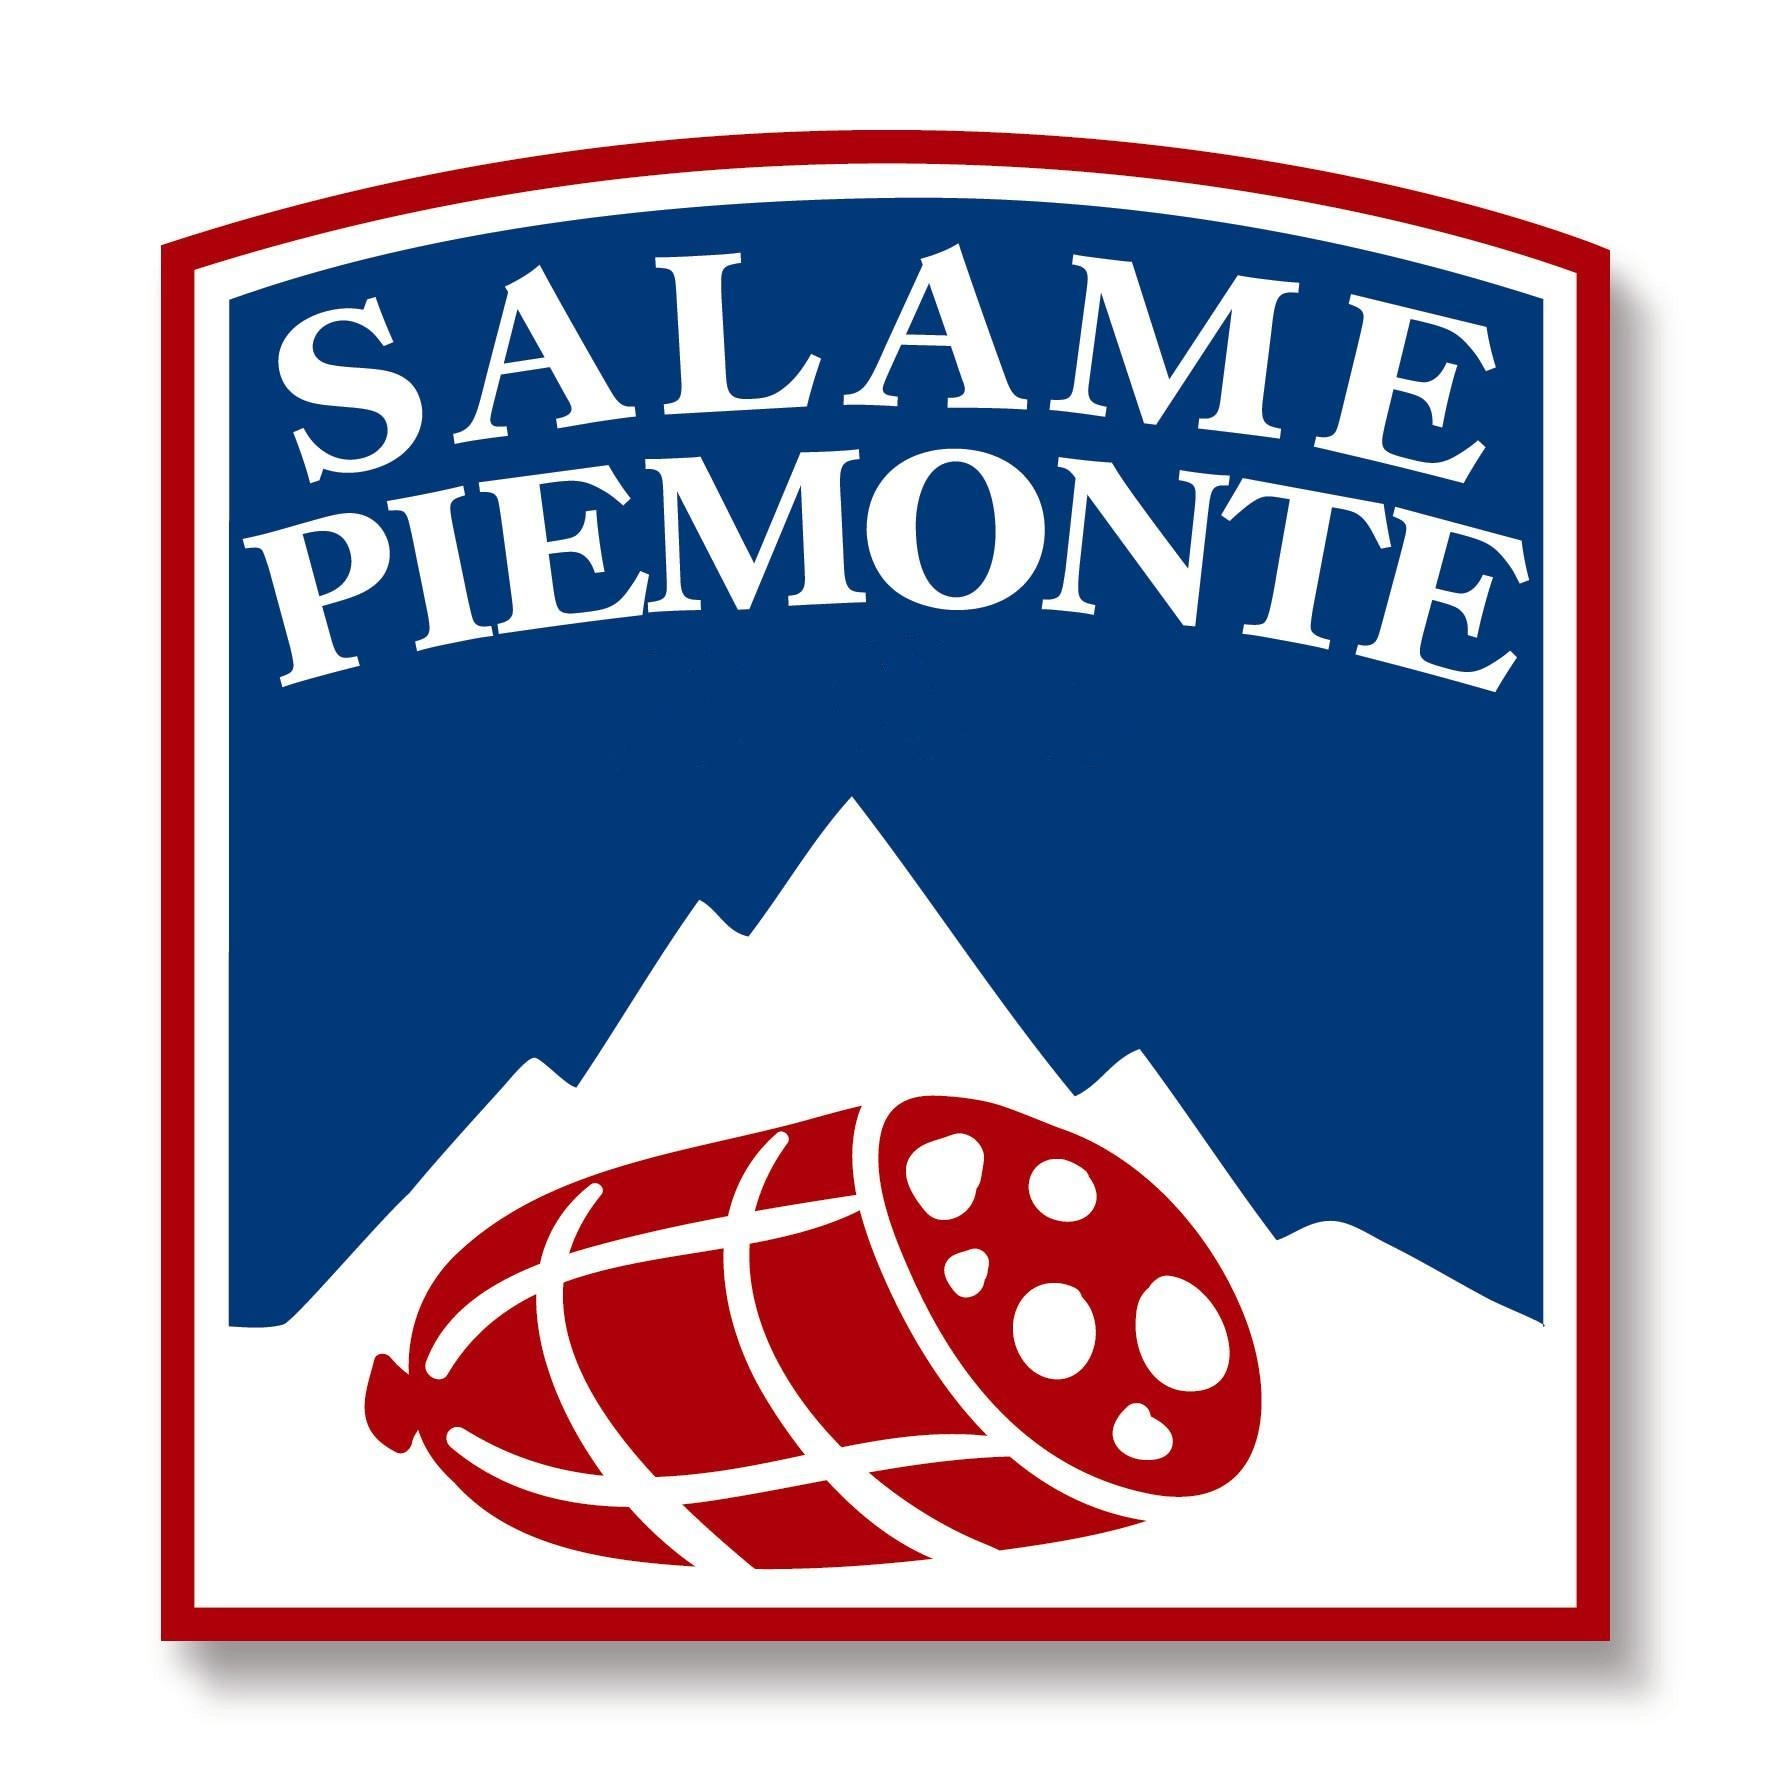 Consorzio Salame Piemonte IGP